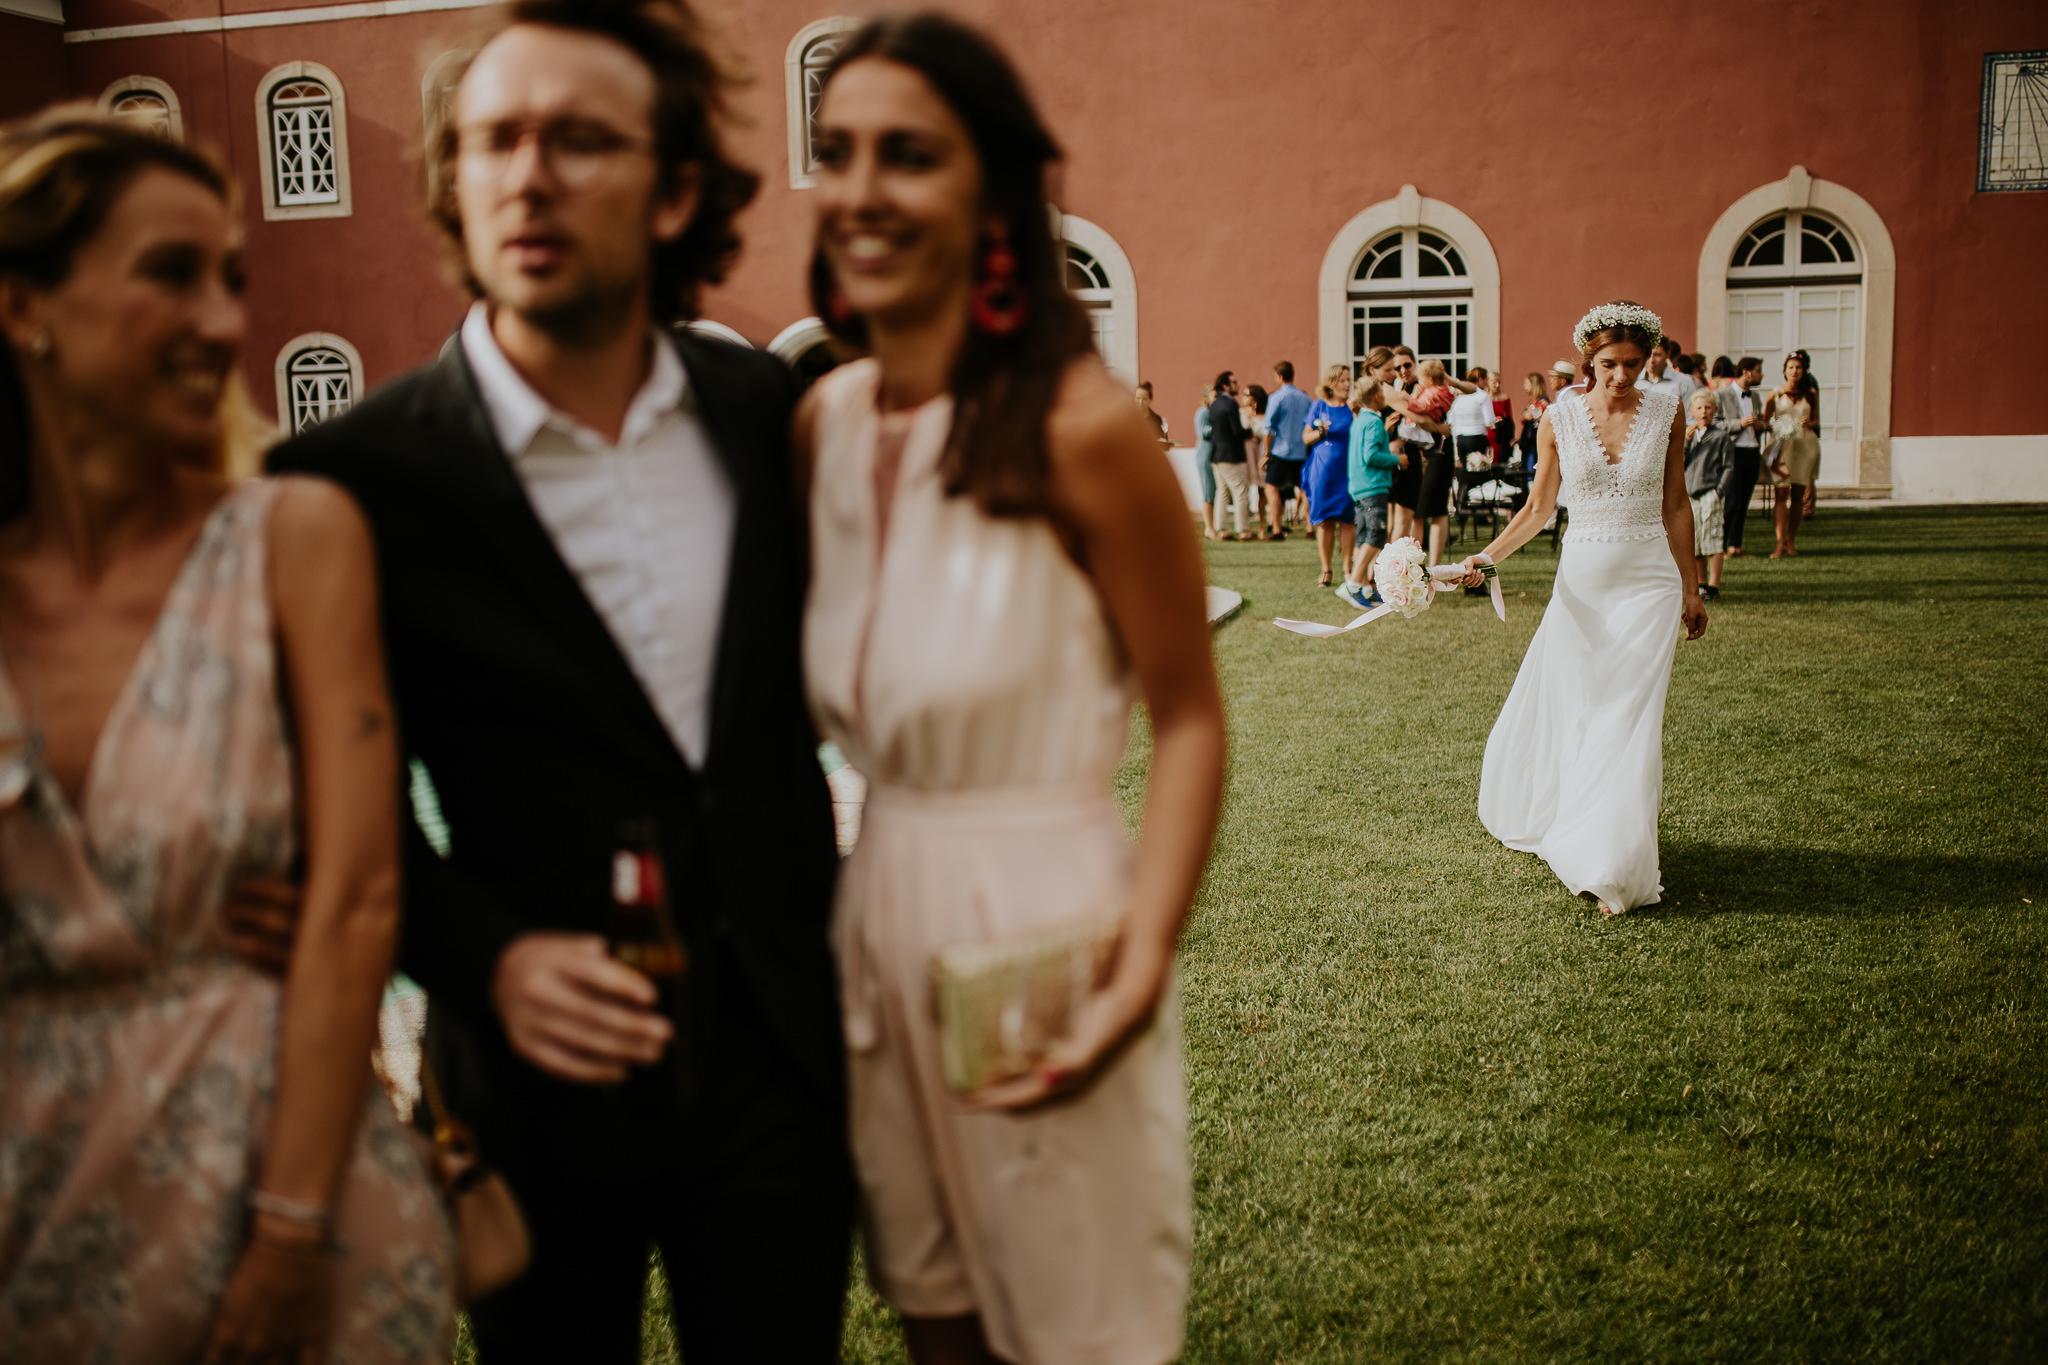 romina_thomas_destination_wedding_photography_fotografia_de_casamento_lisbon_sintra_penha_longa_resort-41